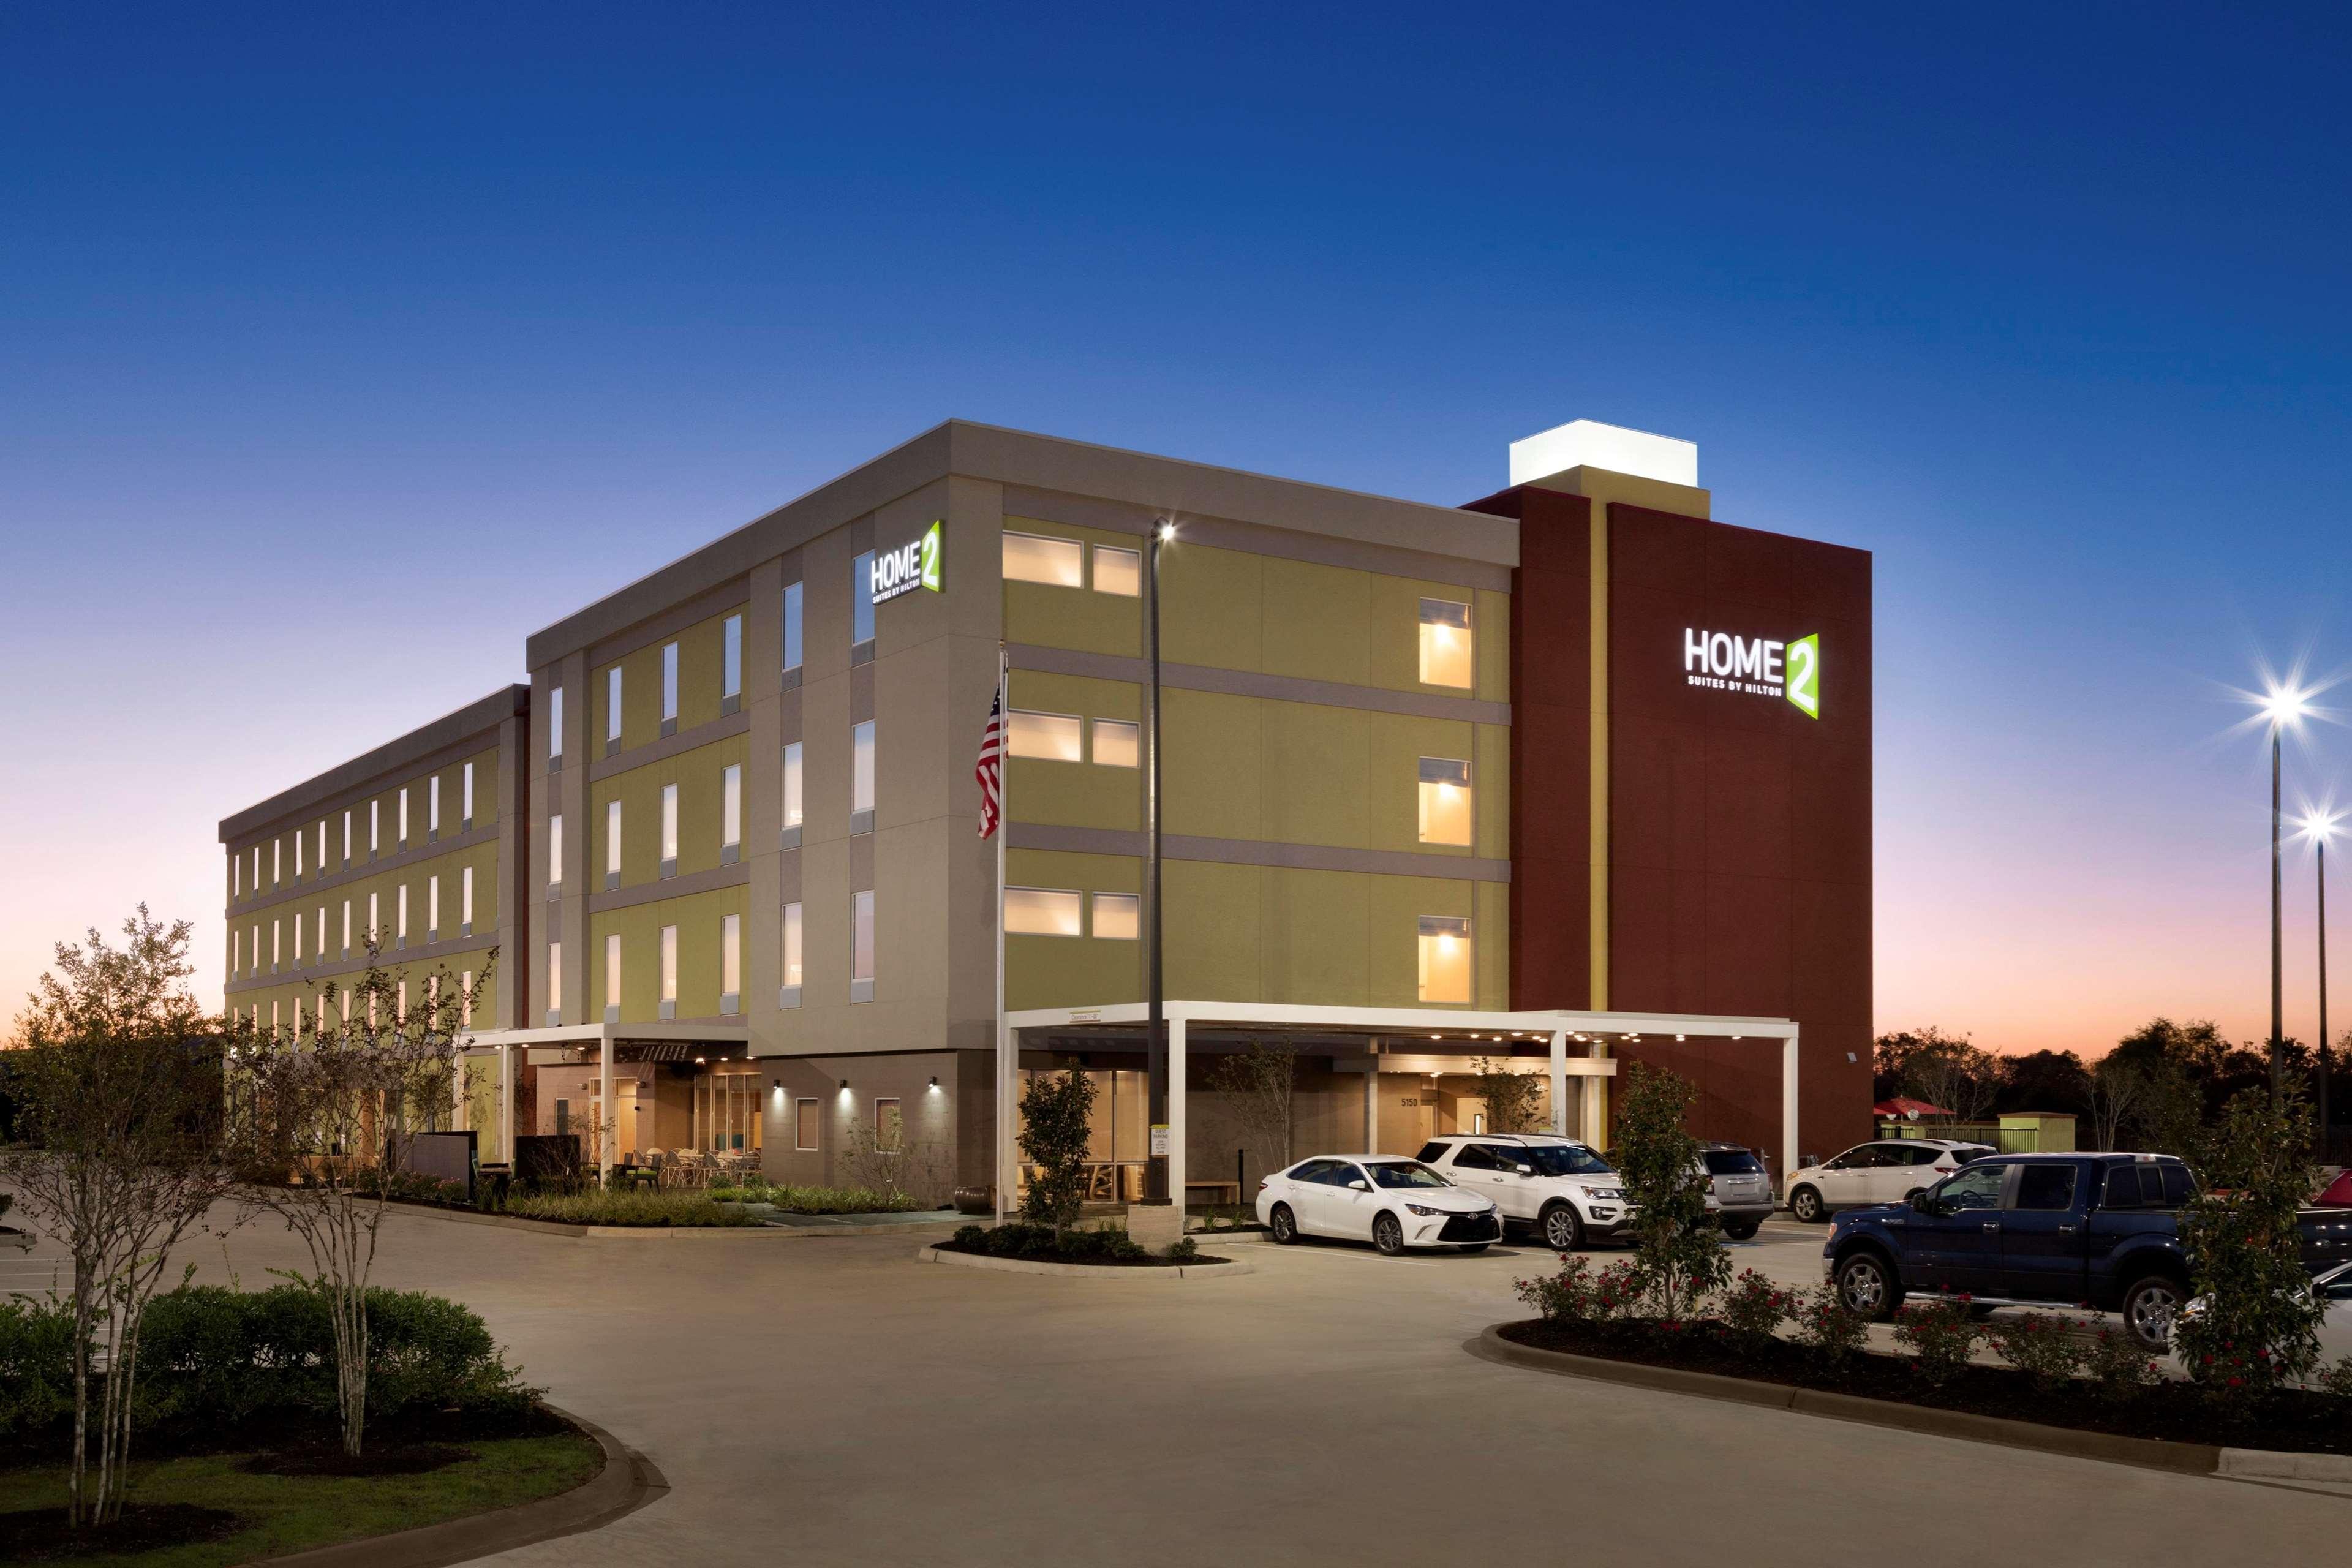 Home2 Suites by Hilton Houston Pasadena image 3